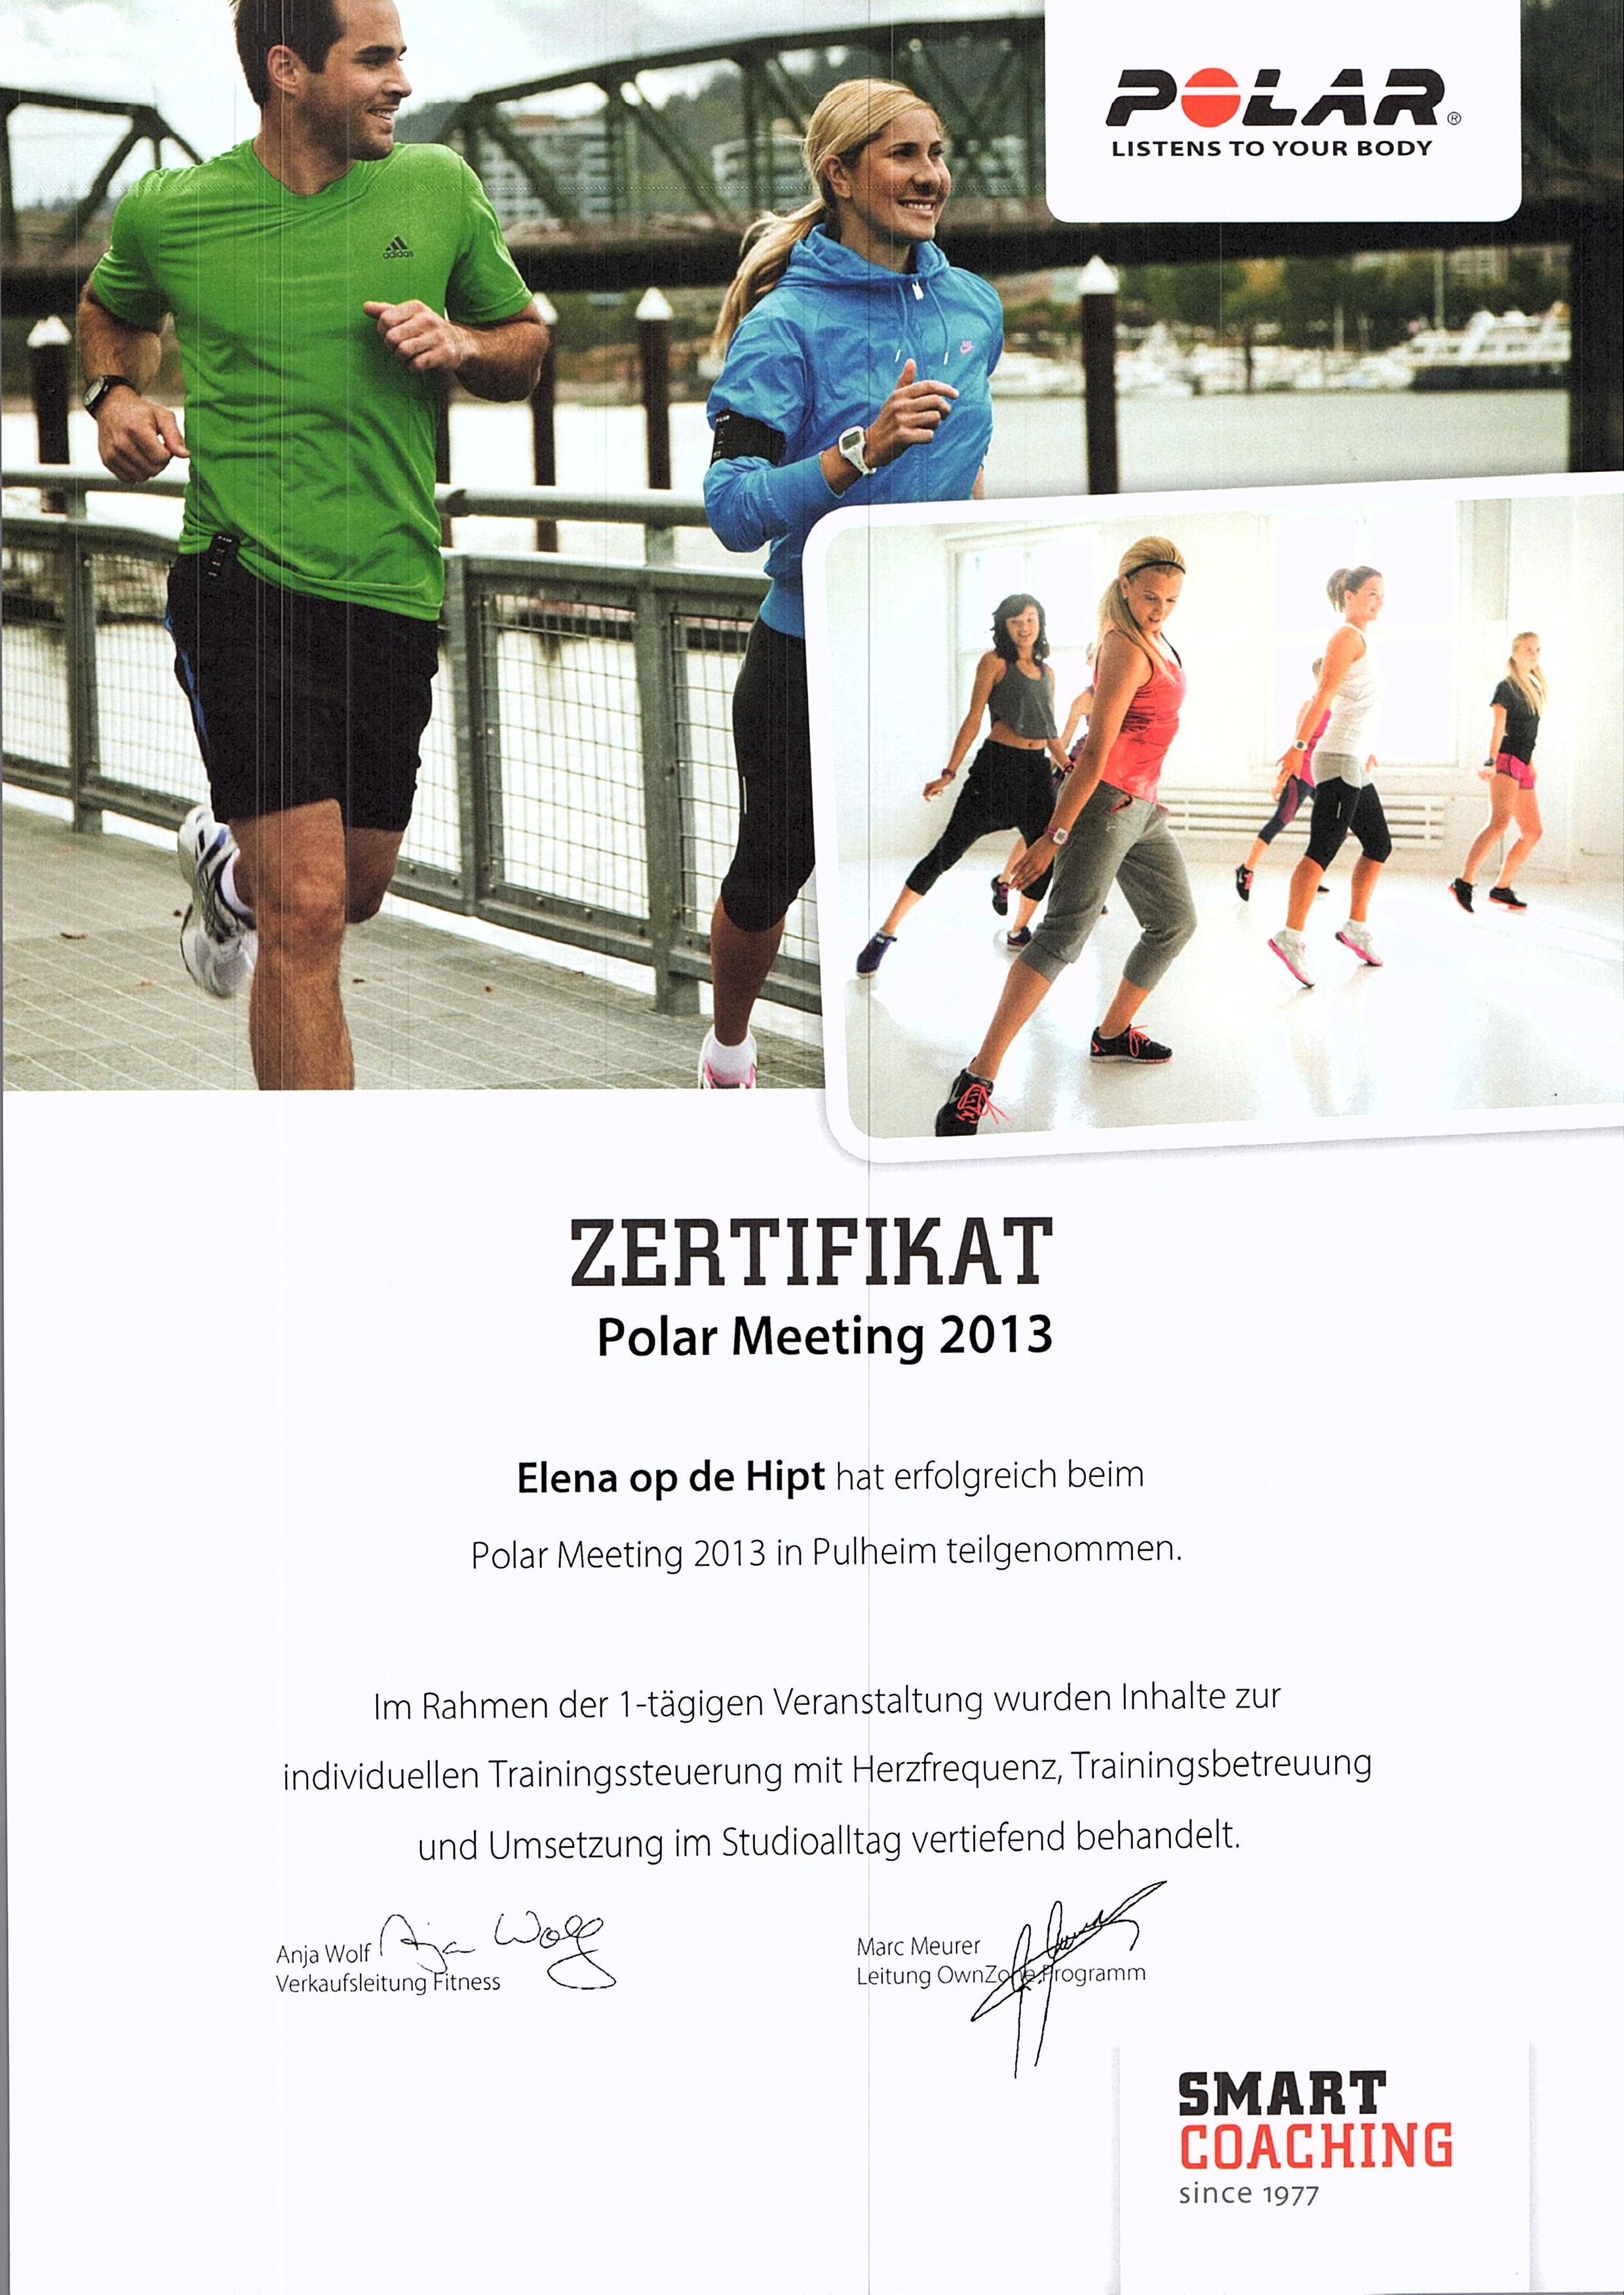 Polar Meeting 2013